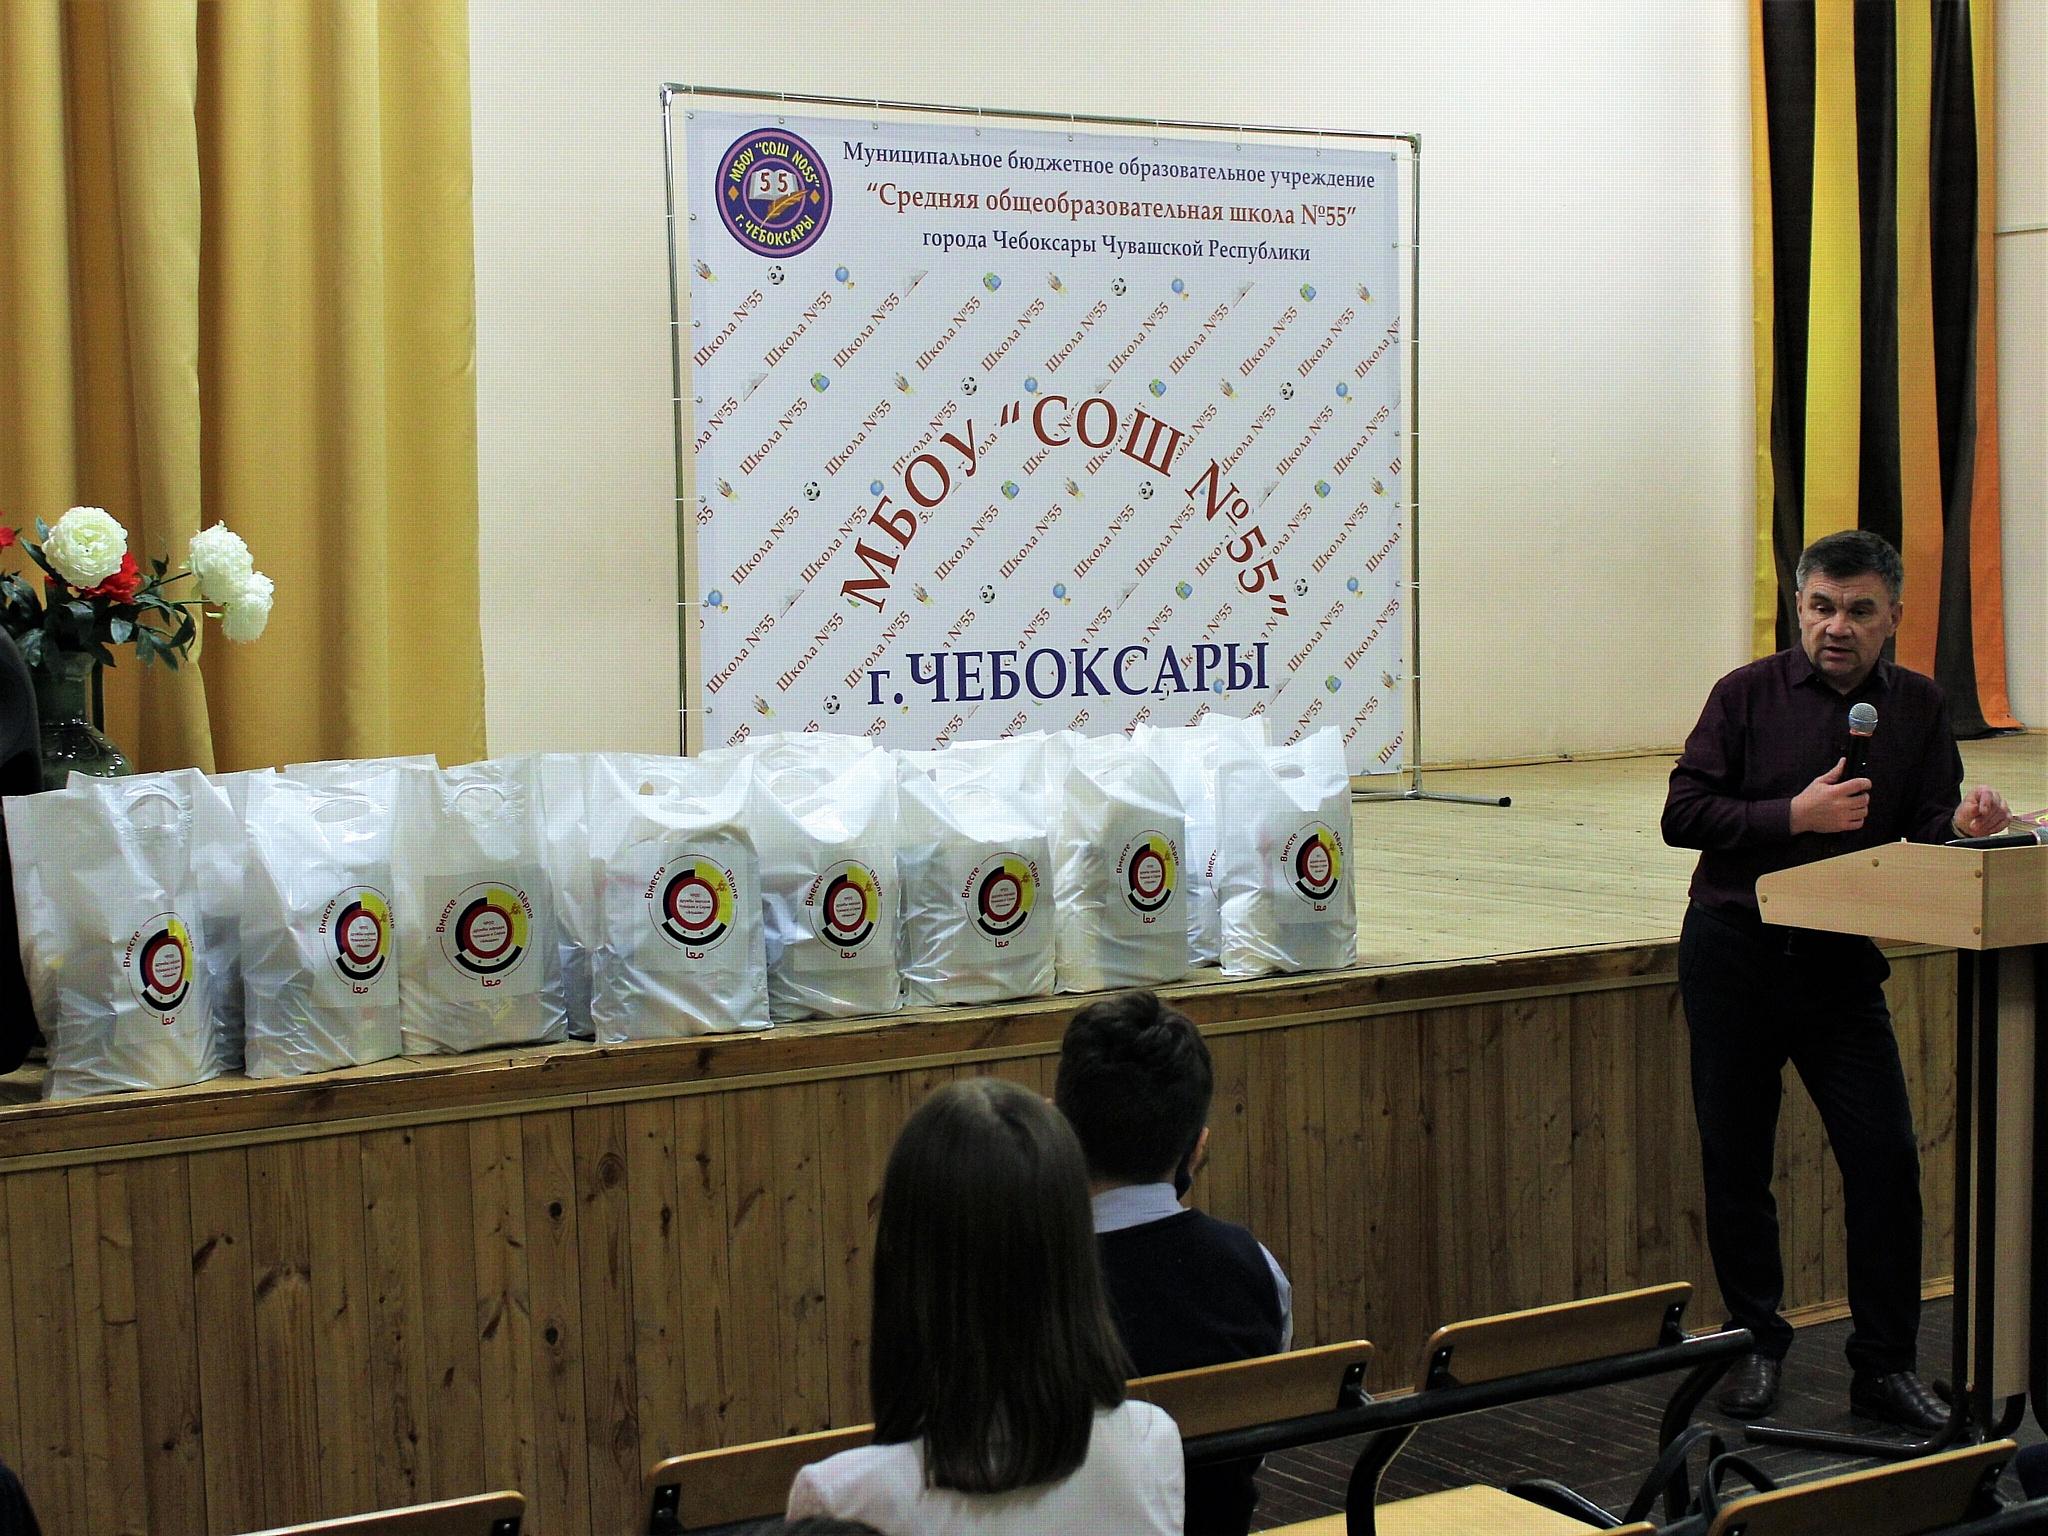 Сирийский культурный центр Чувашии - участник акции «Ёлка желаний»